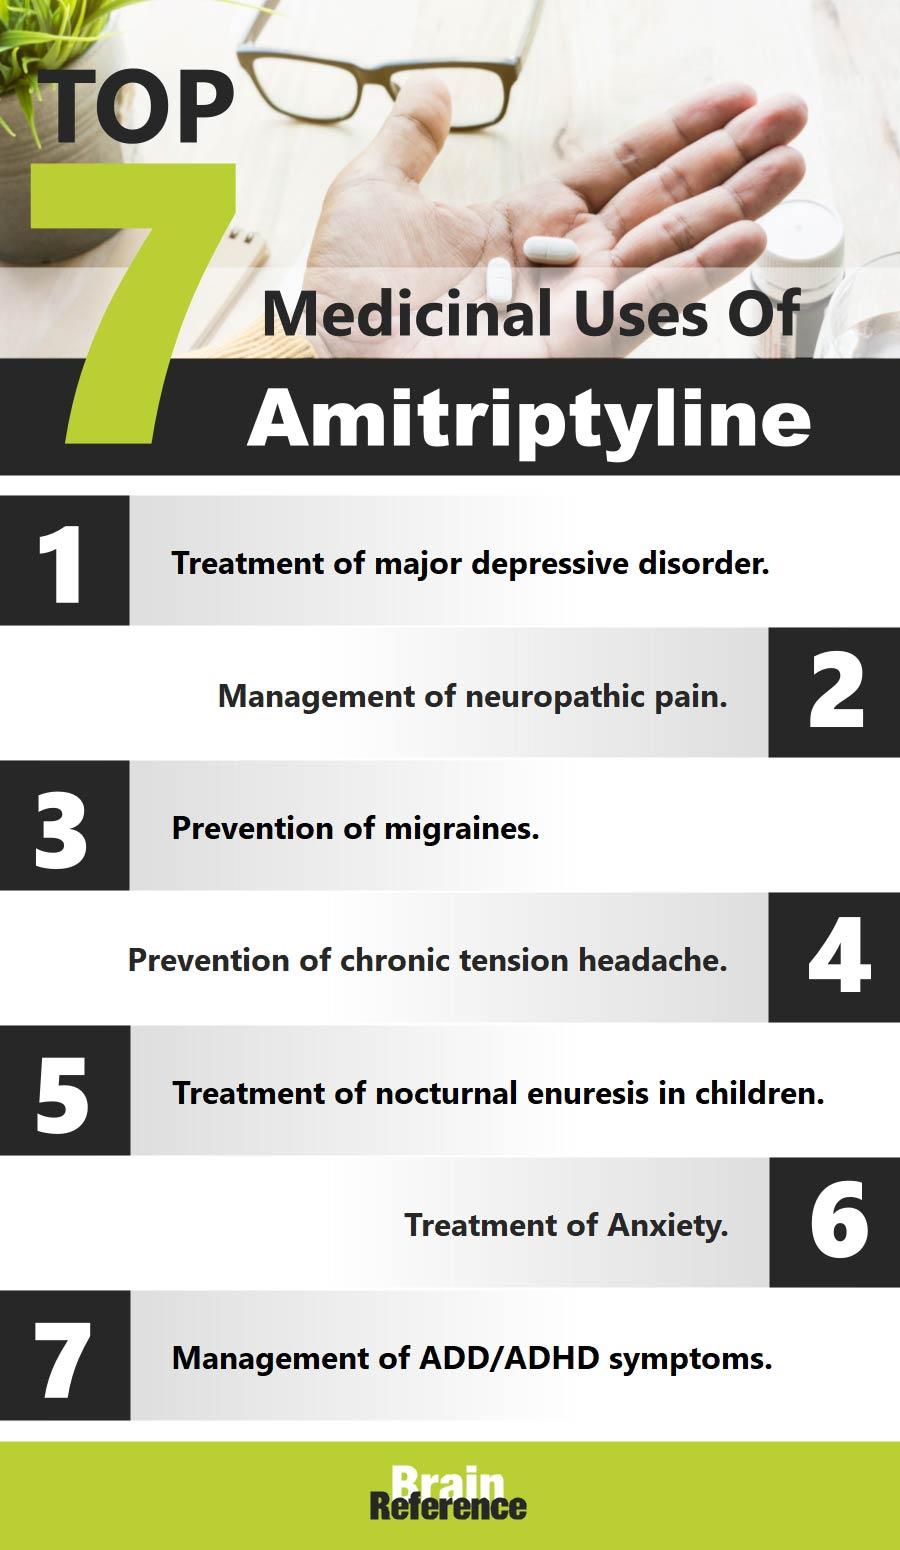 Elavil-Amitriptyline-Rexall-Pharmacy-Medicinal-Uses